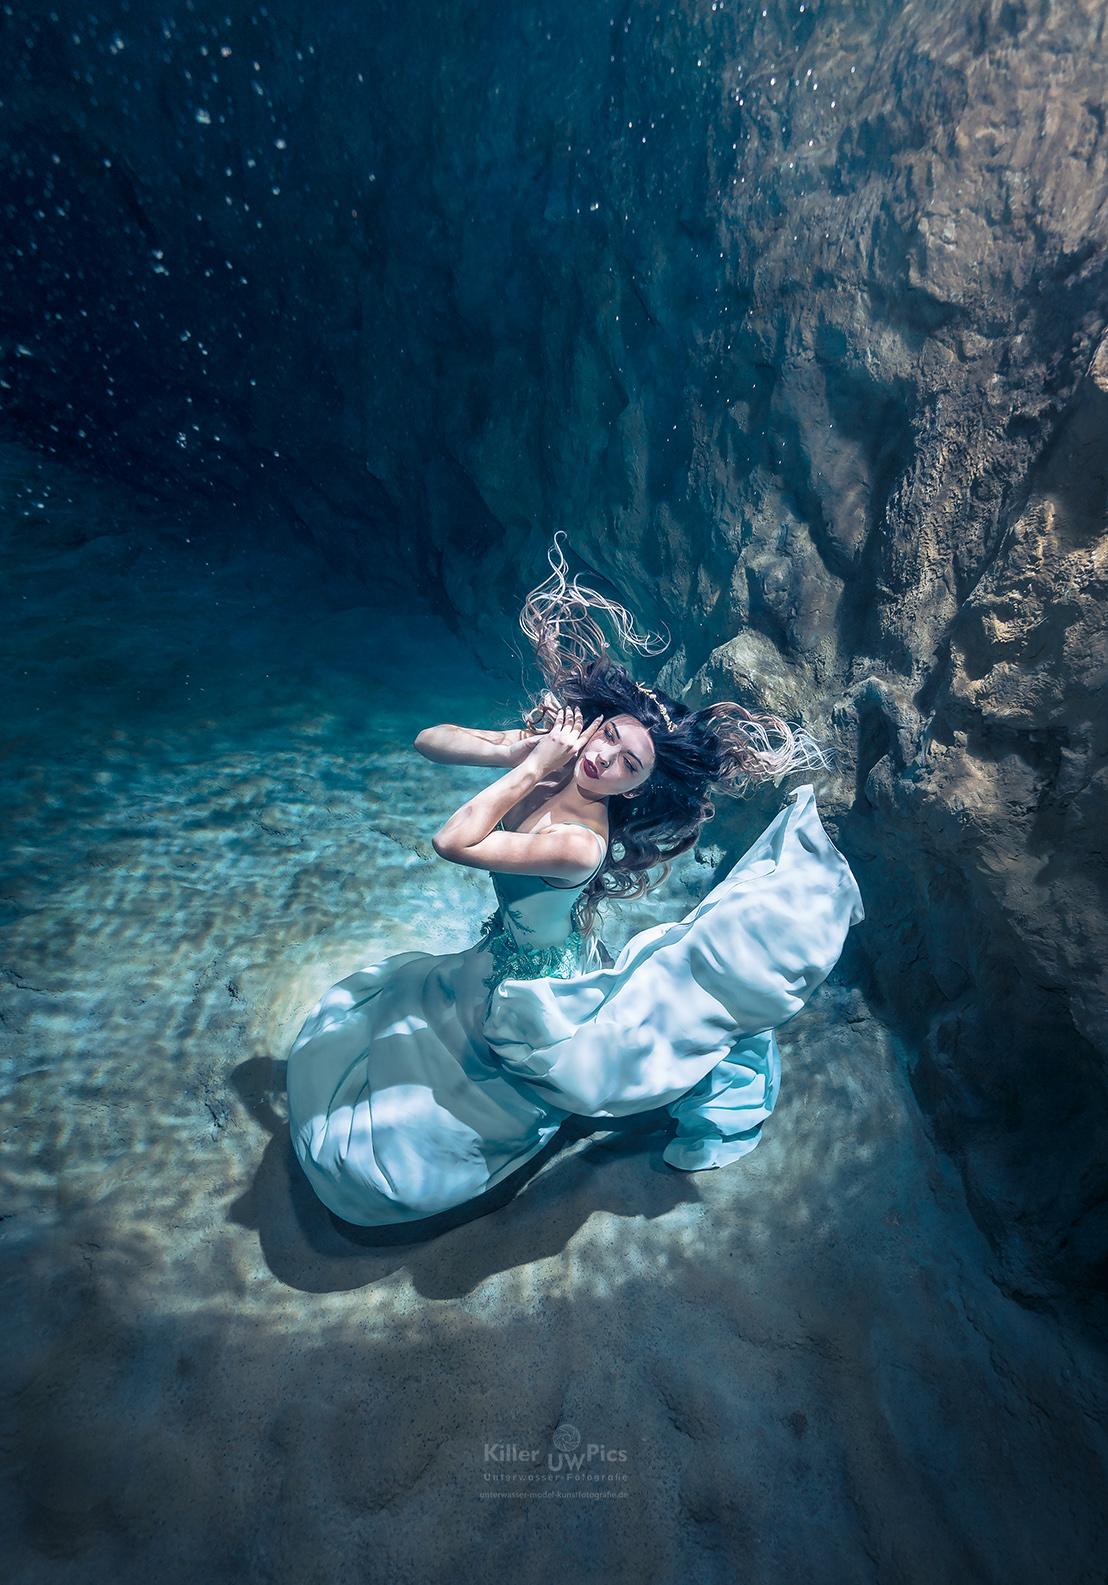 (C) Fotograf: Konstantin Killer, Model: Katharina Palzer, Unterwasser Shooting